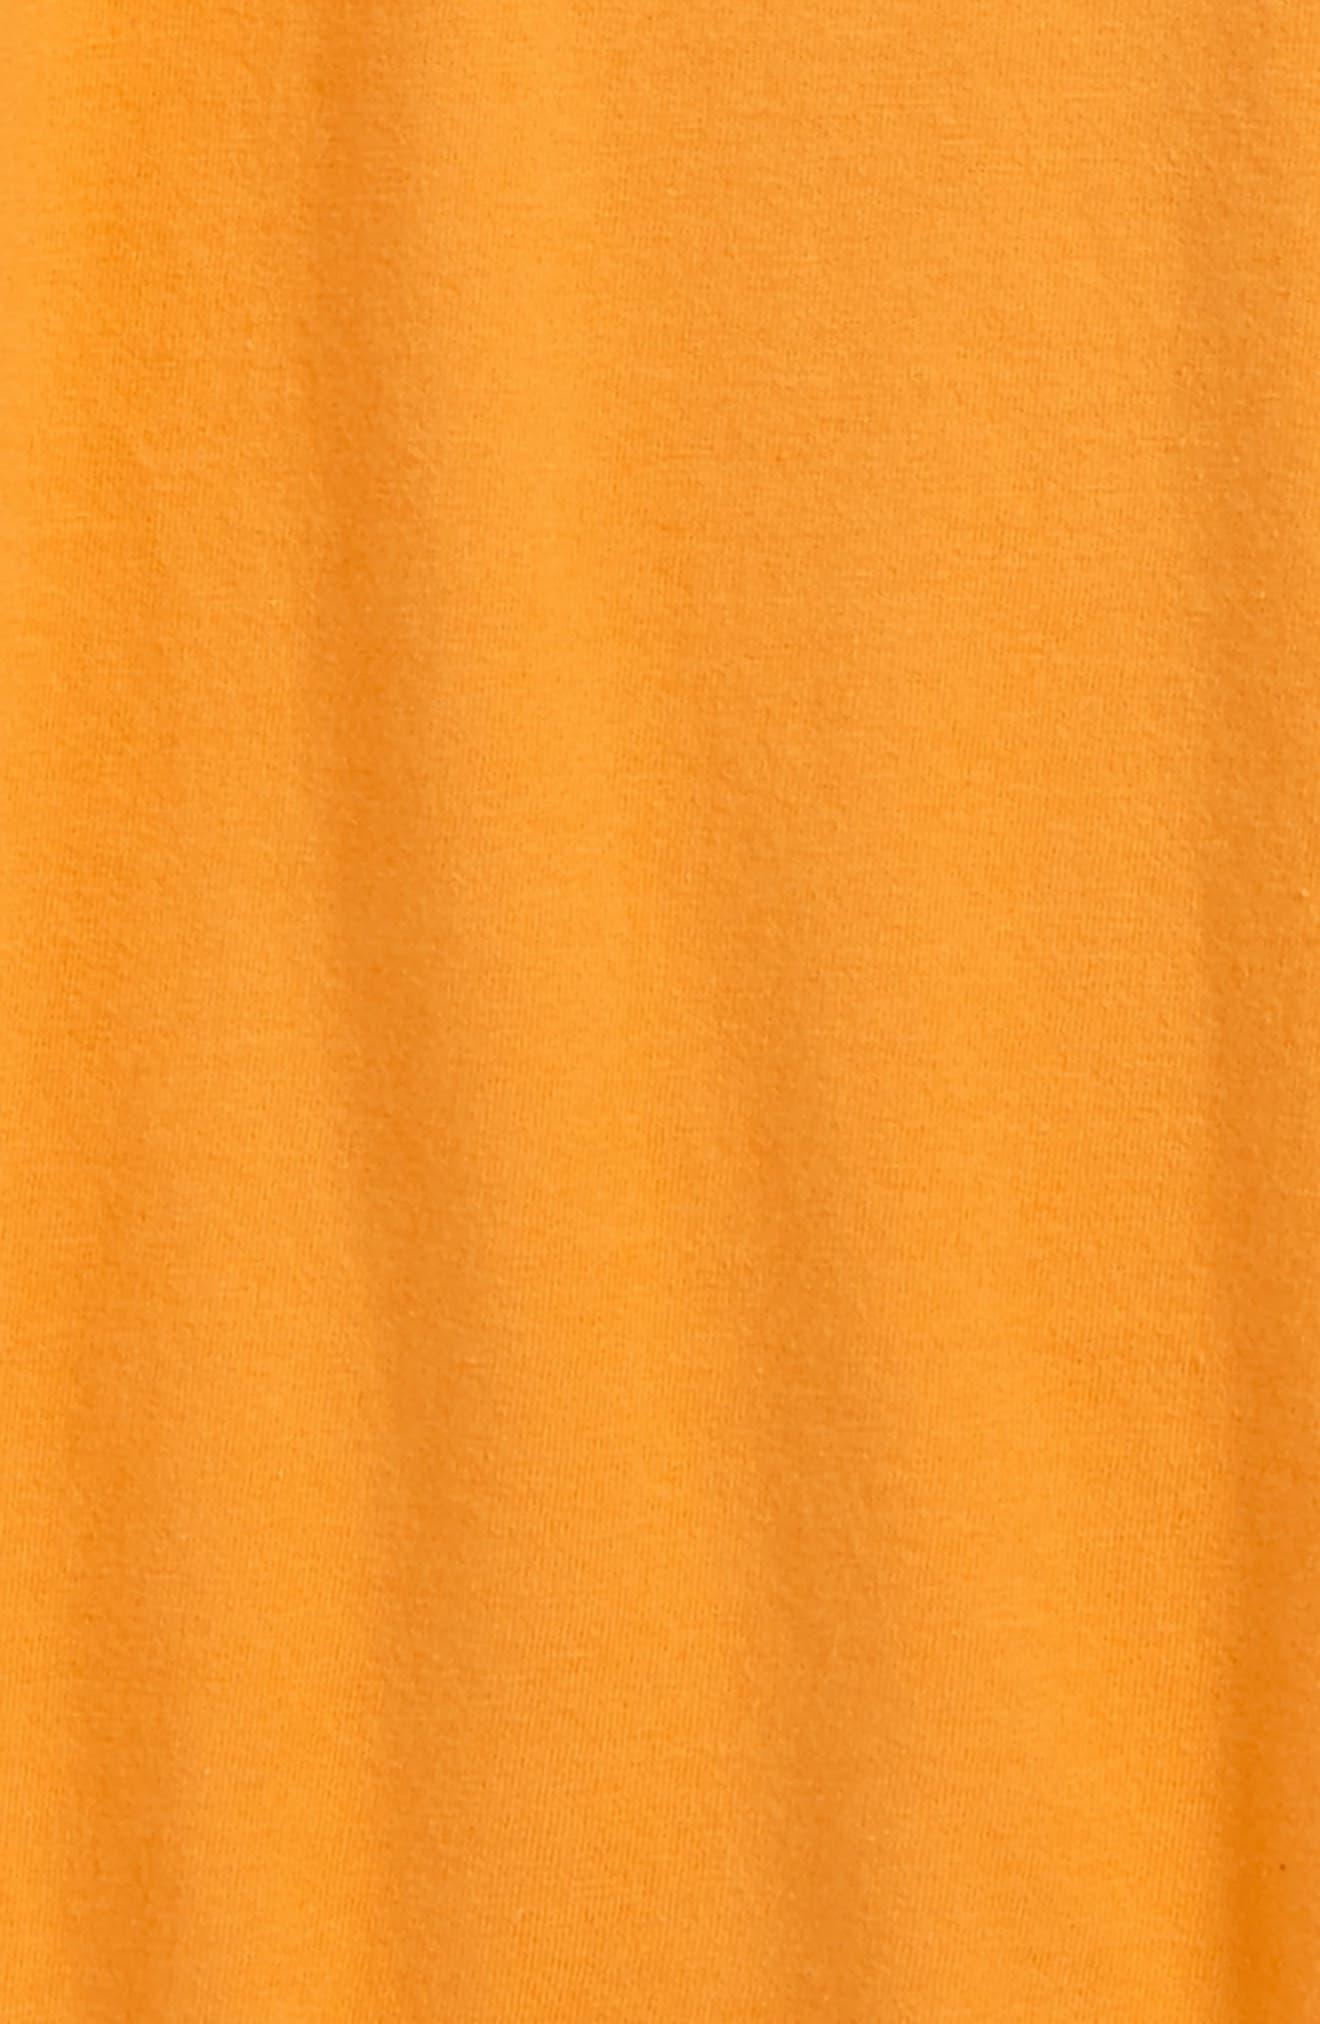 Alternate Image 2  - Burt's Bees Baby V-Neck Organic Cotton T-Shirt (Toddler Boys & Little Boys)